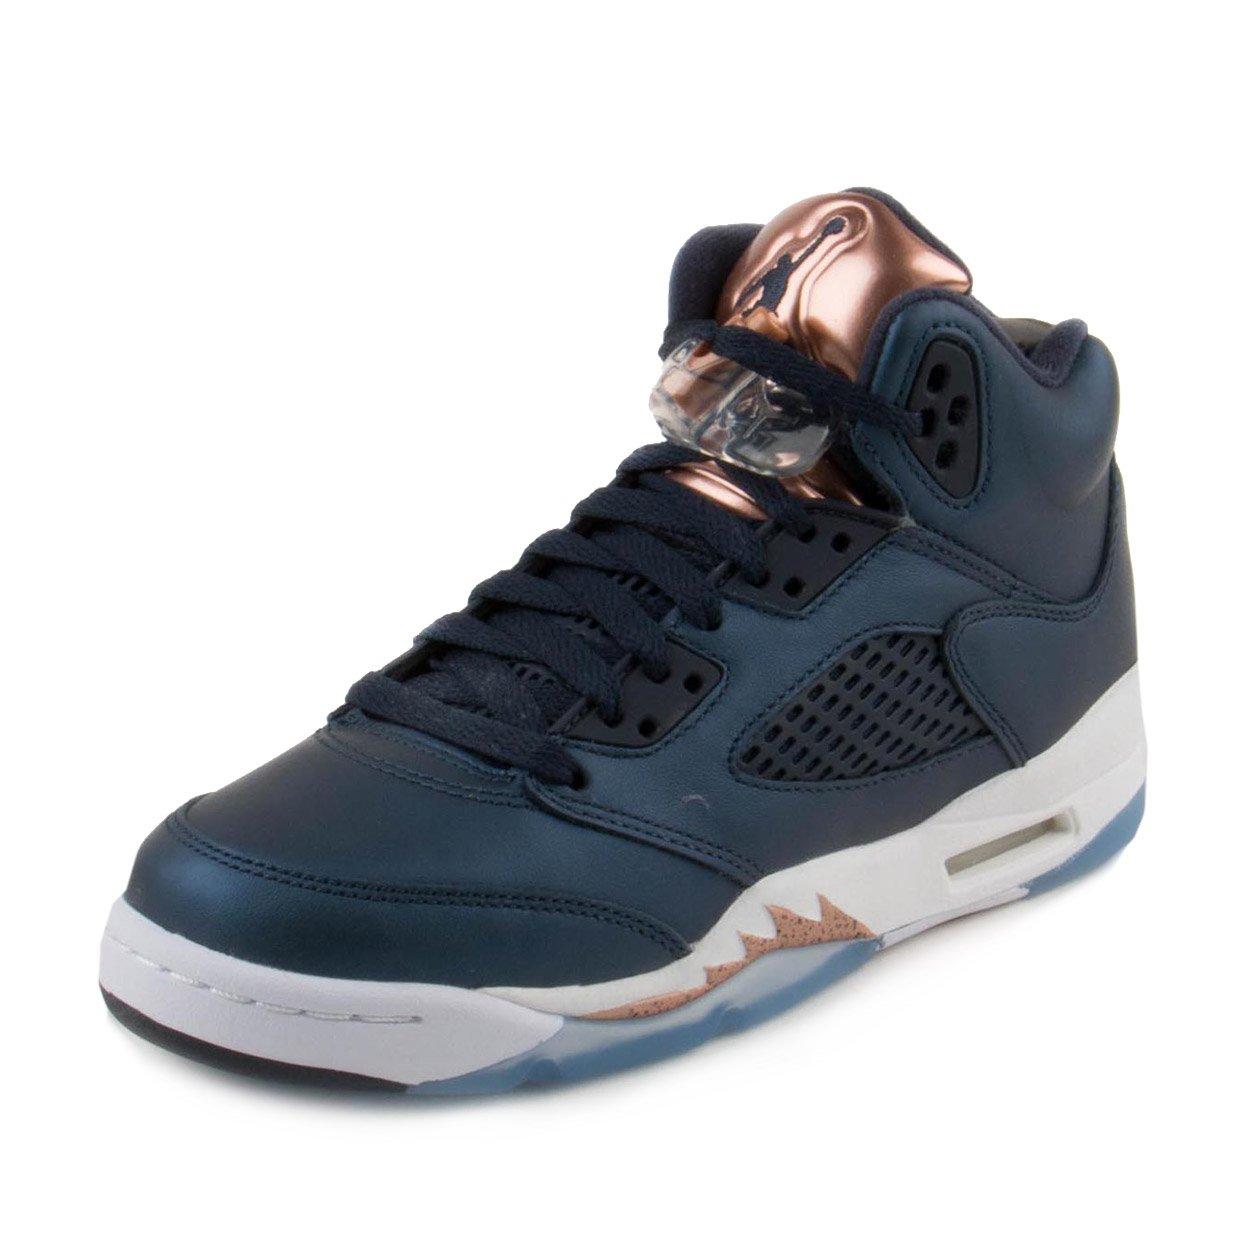 e9cde70053f2be Jordan Air 5 Retro BG Bronze V Youth Lifestyle Sneakers Obsidian - 5.5